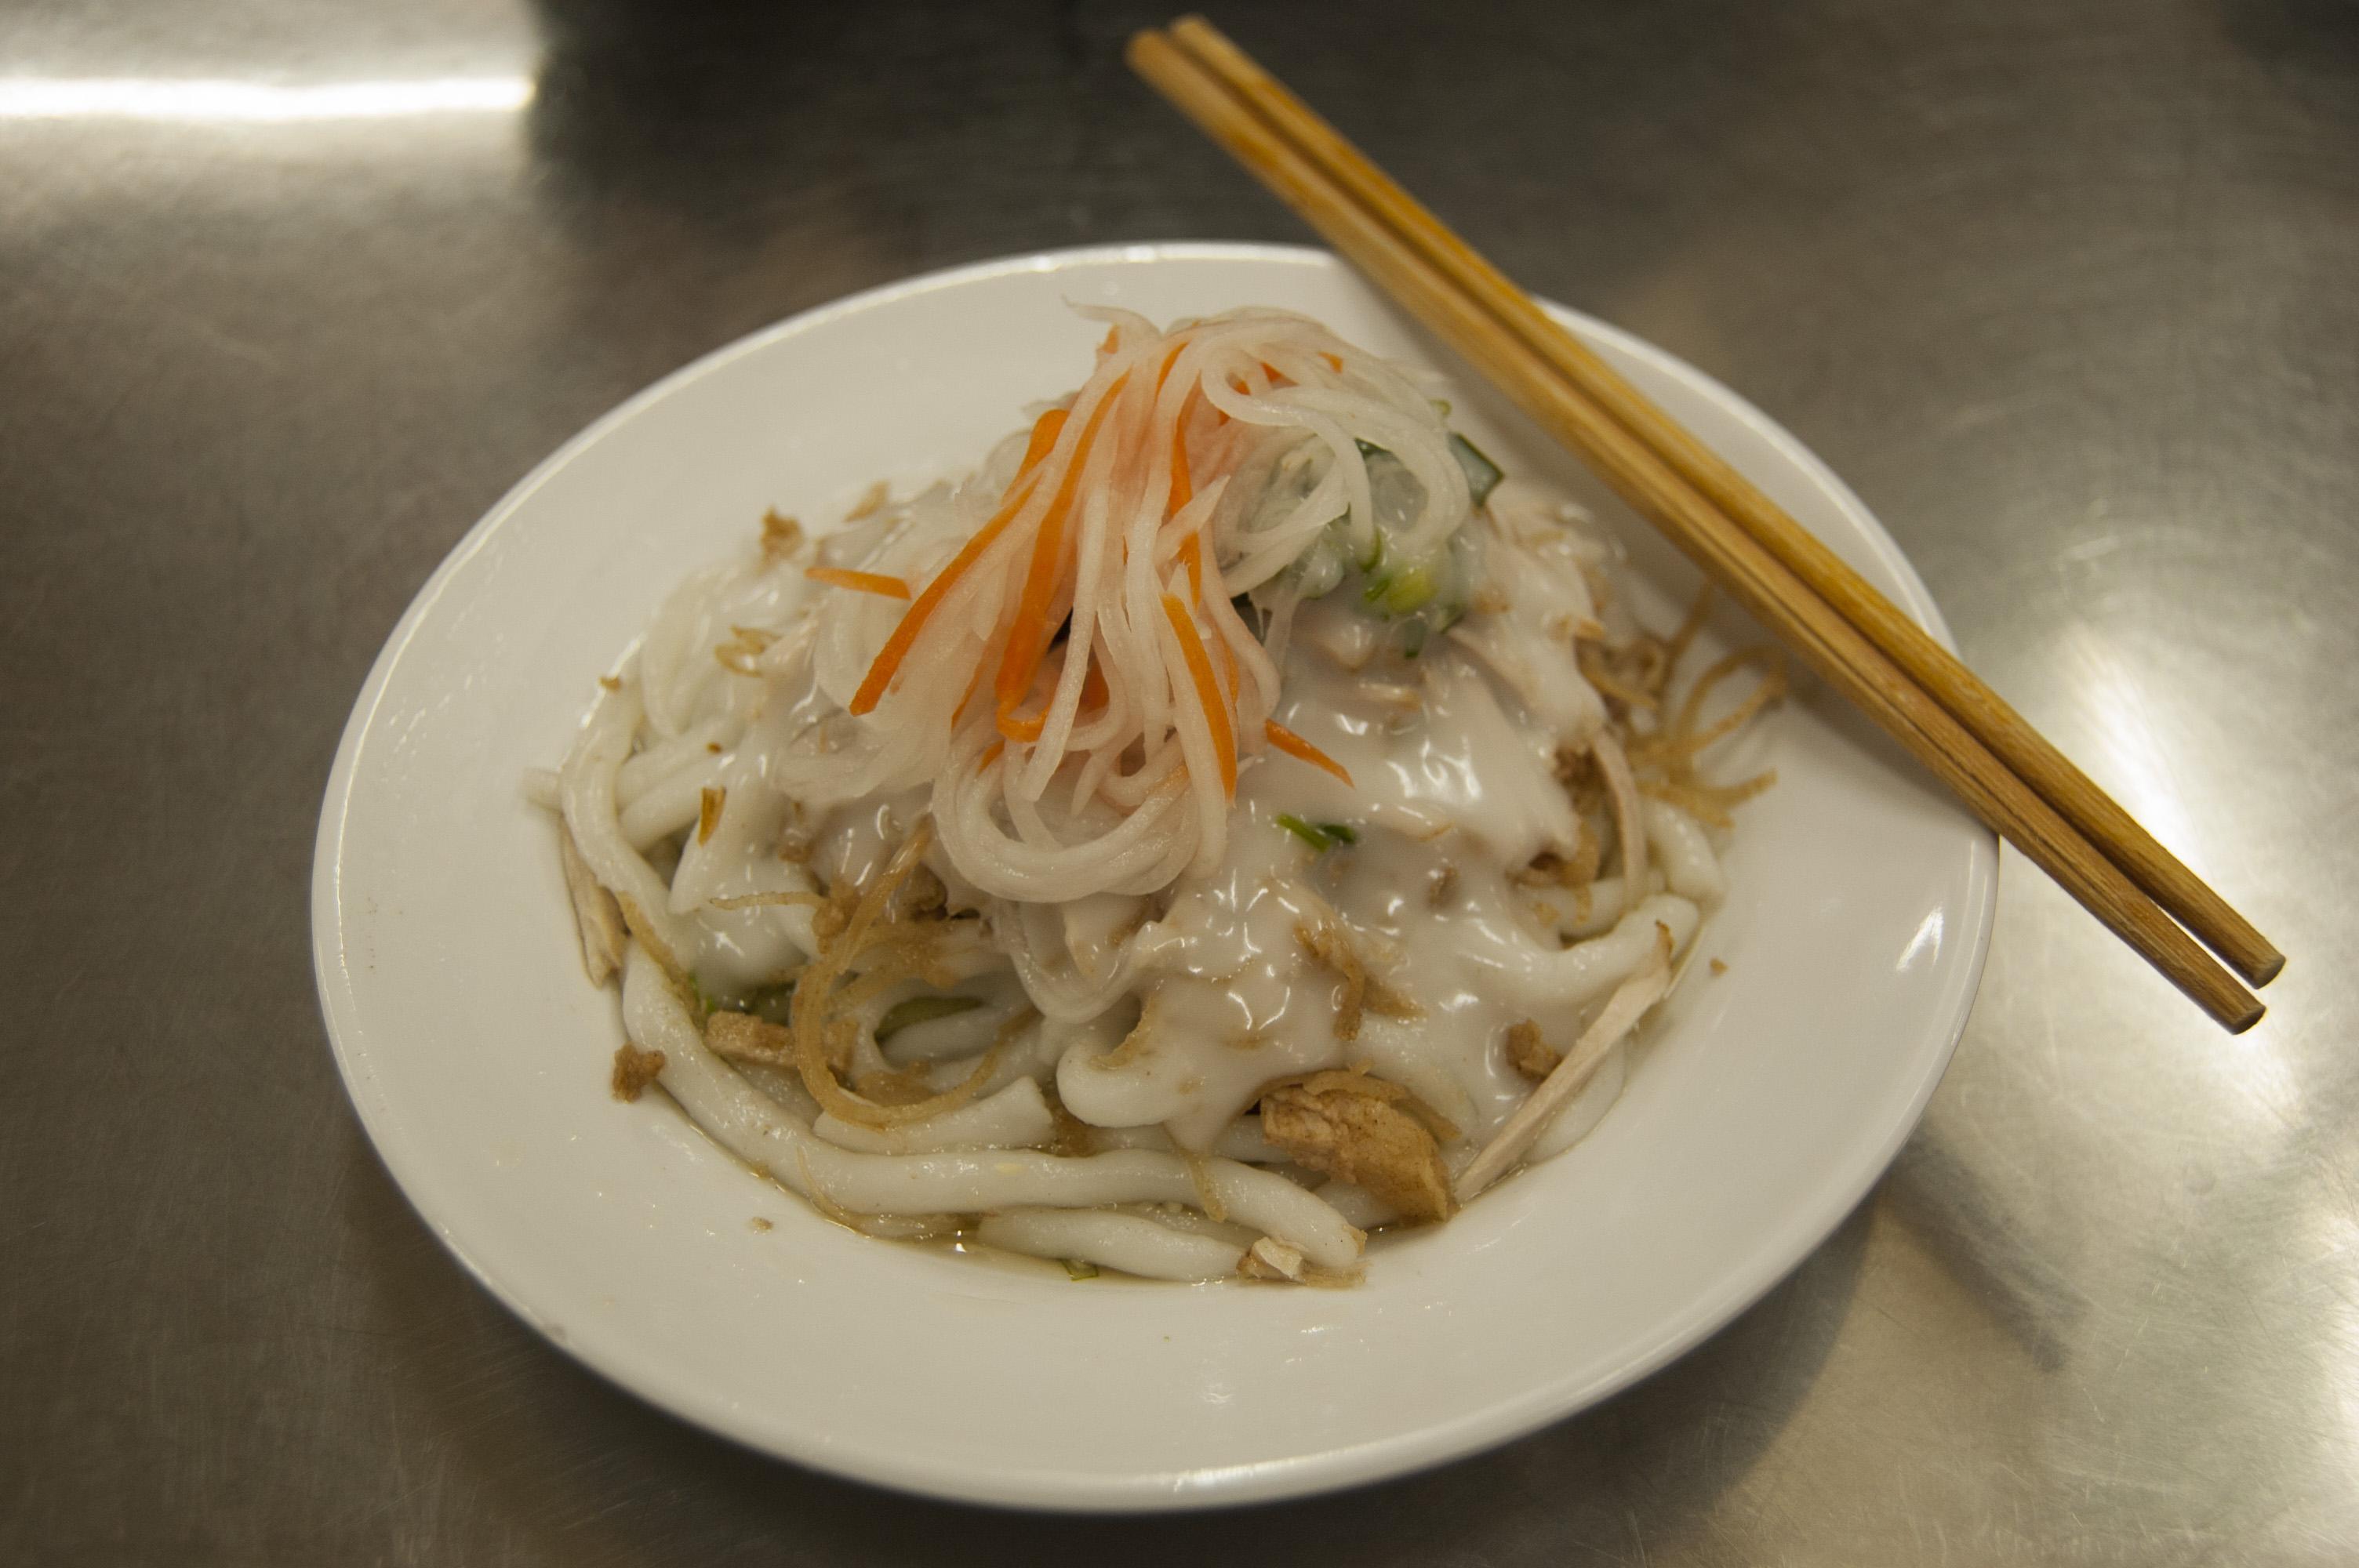 South Vietnamese food